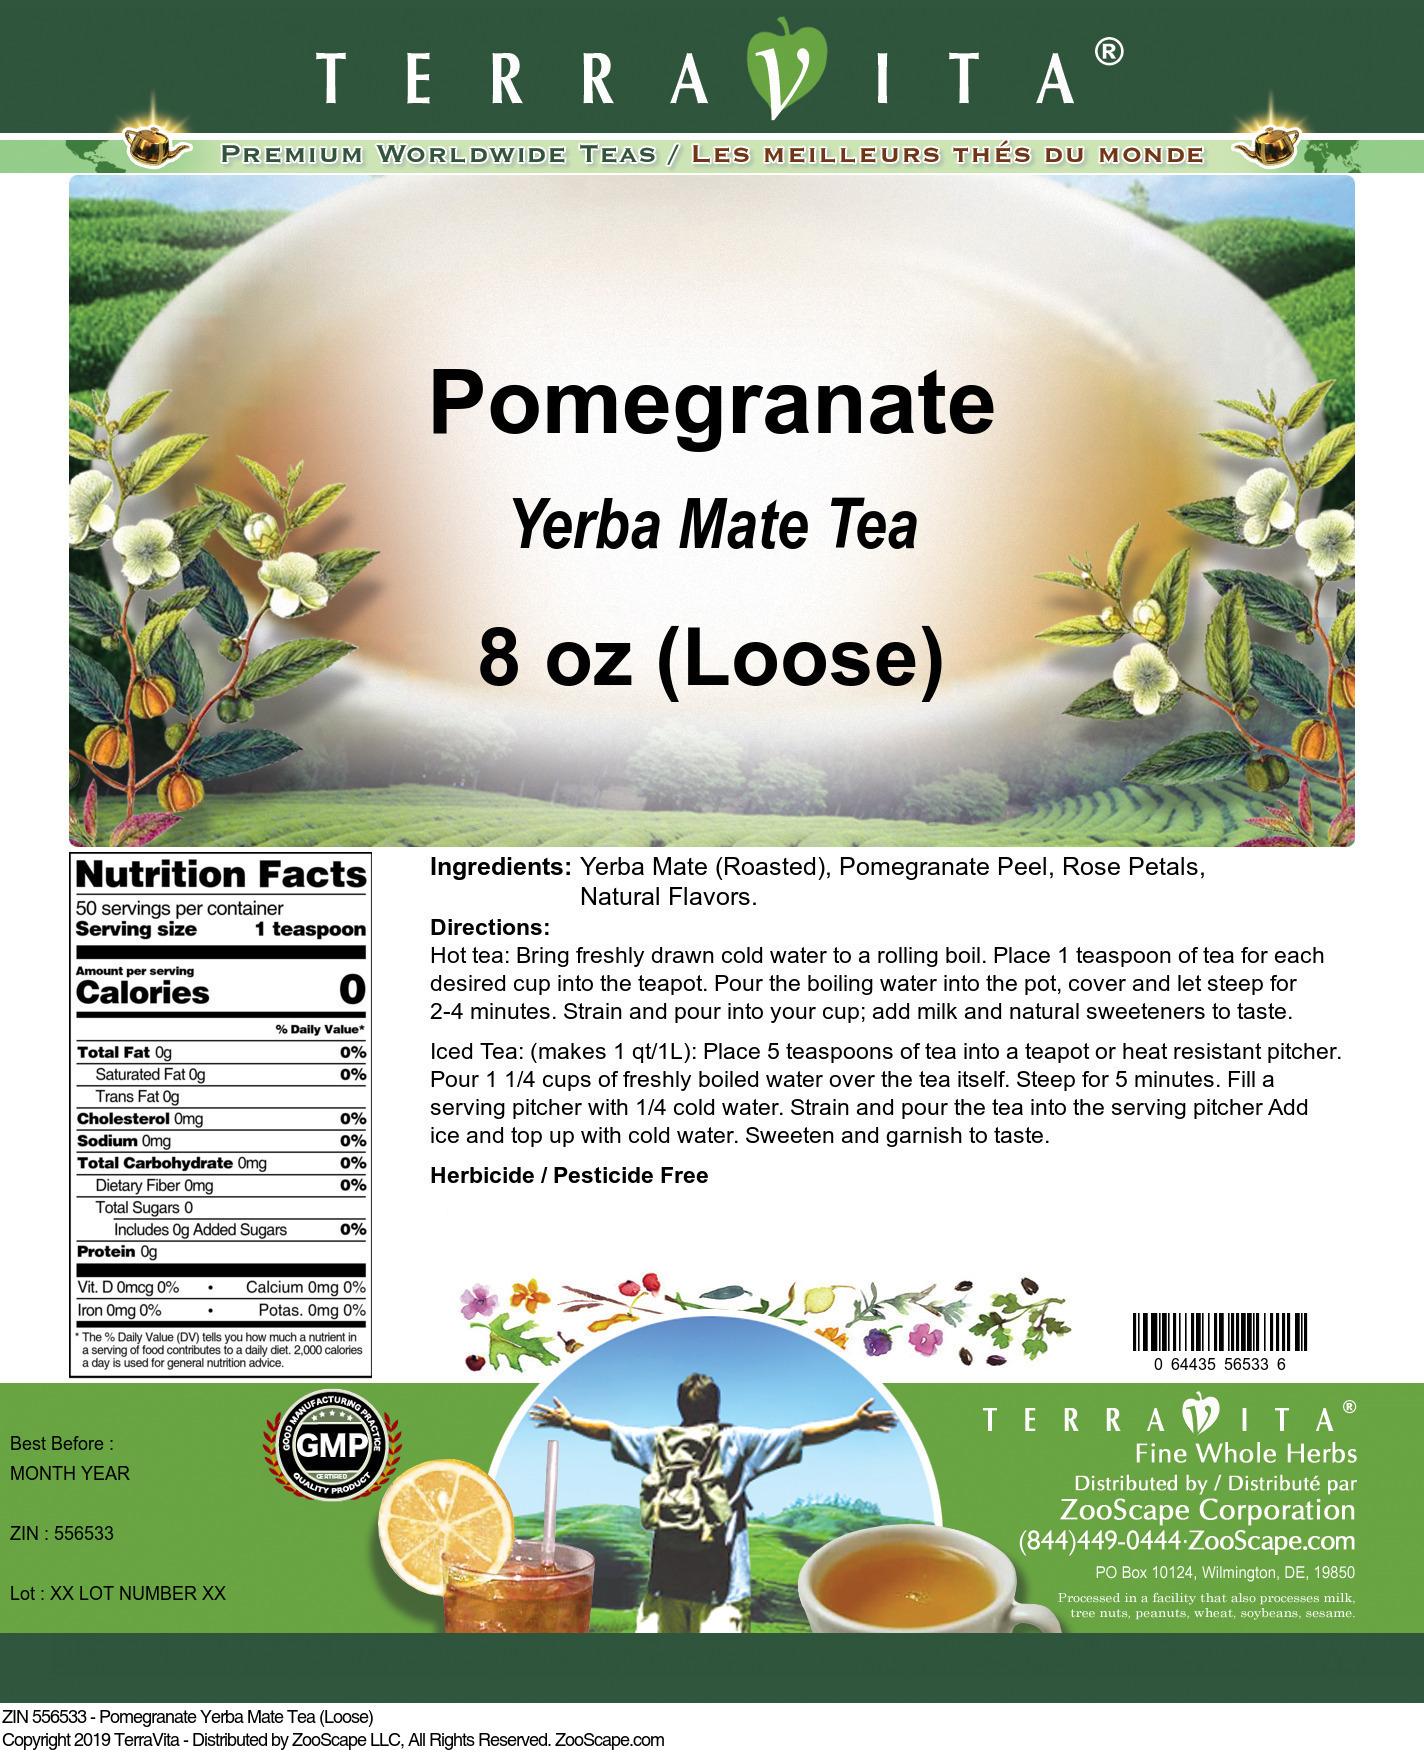 Pomegranate Yerba Mate